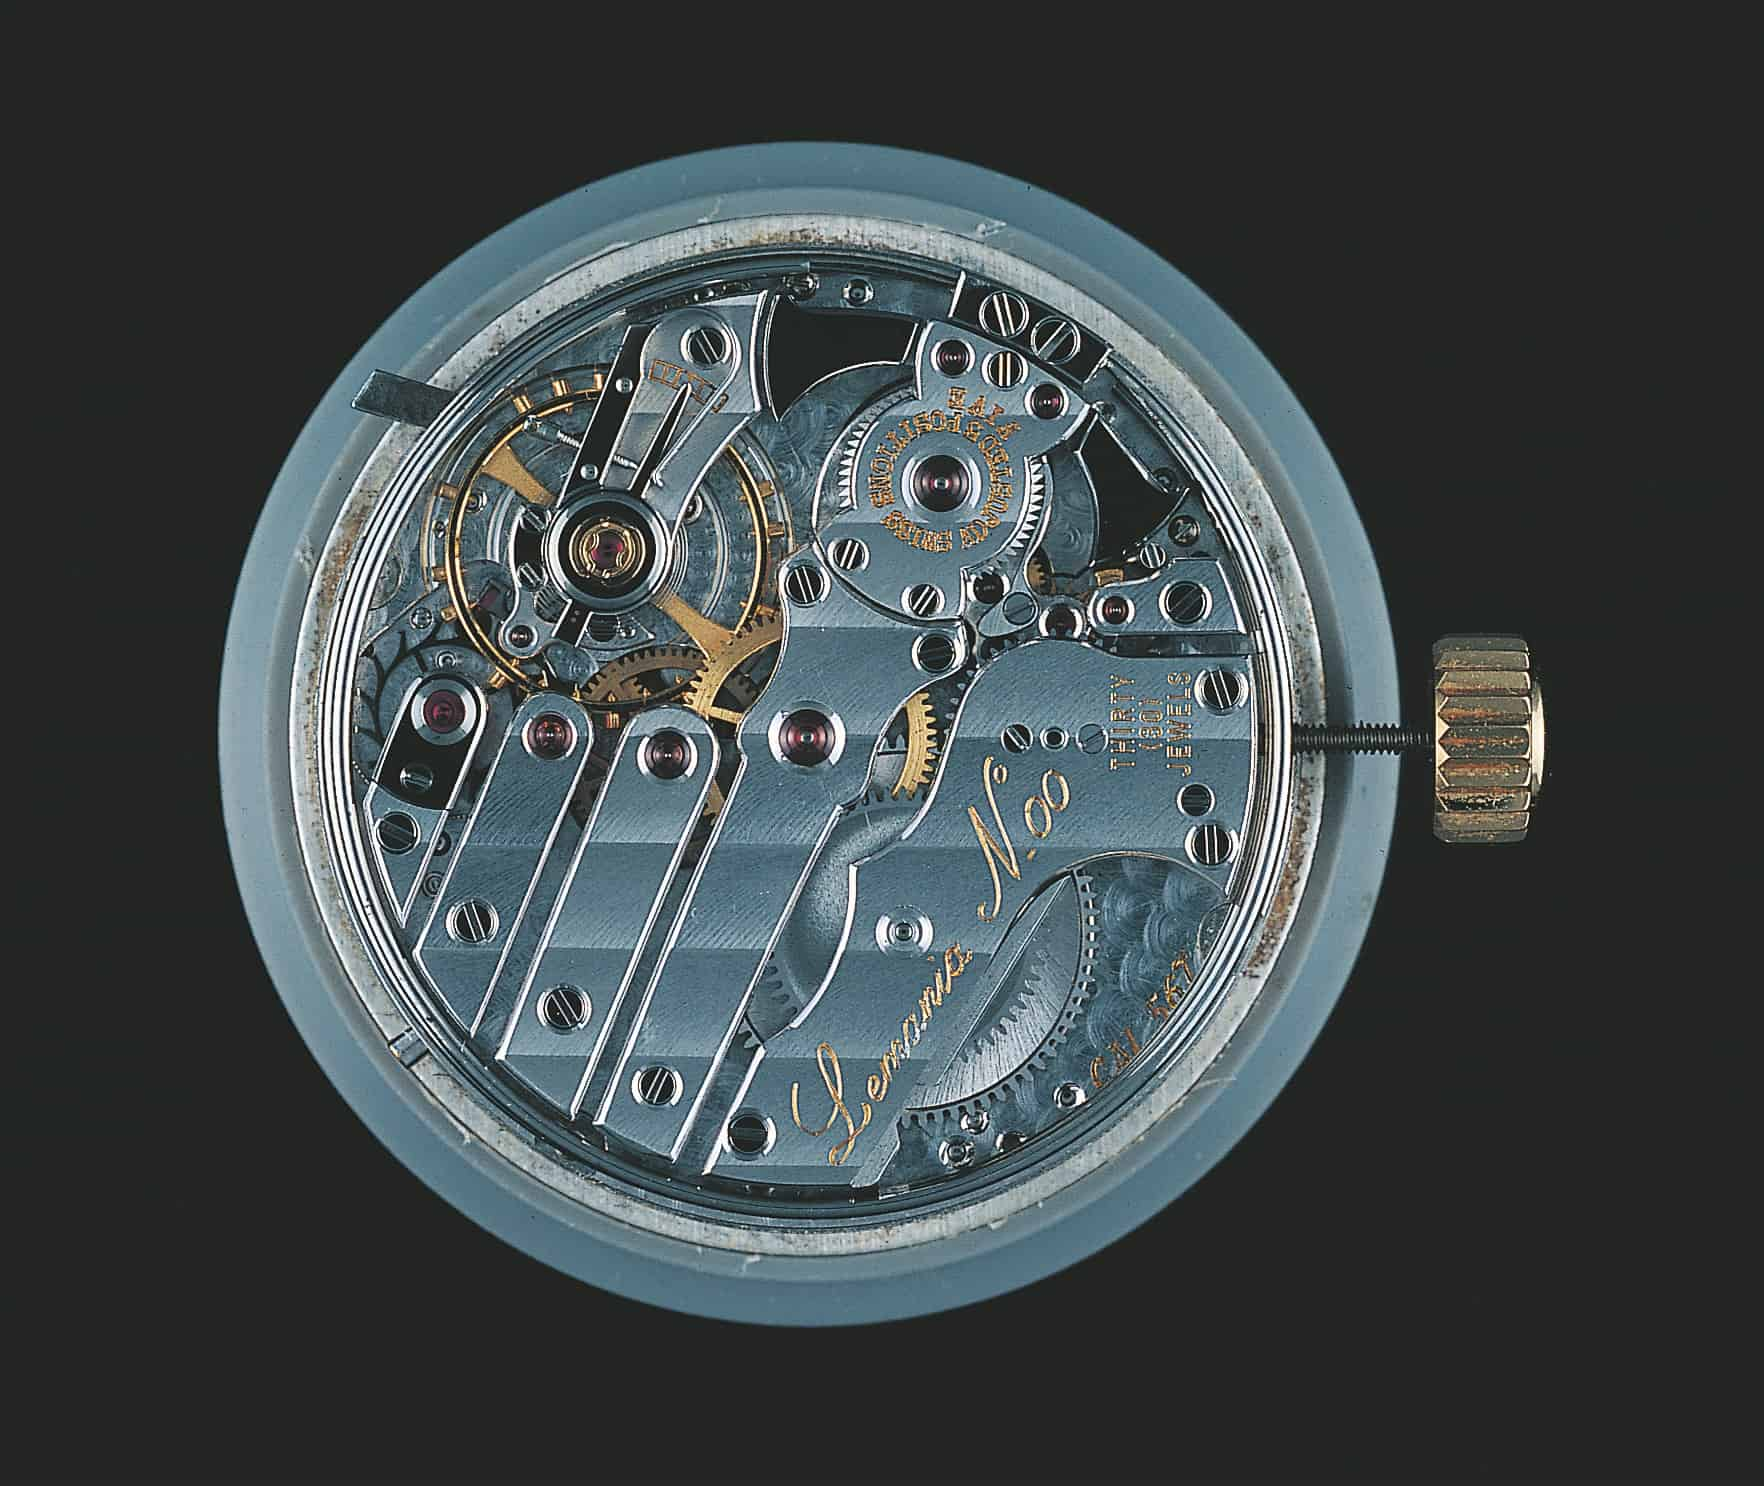 Lémania-Kaliber-389-Minutenrepetition-1997-Rückseite-Uhrenkosmos